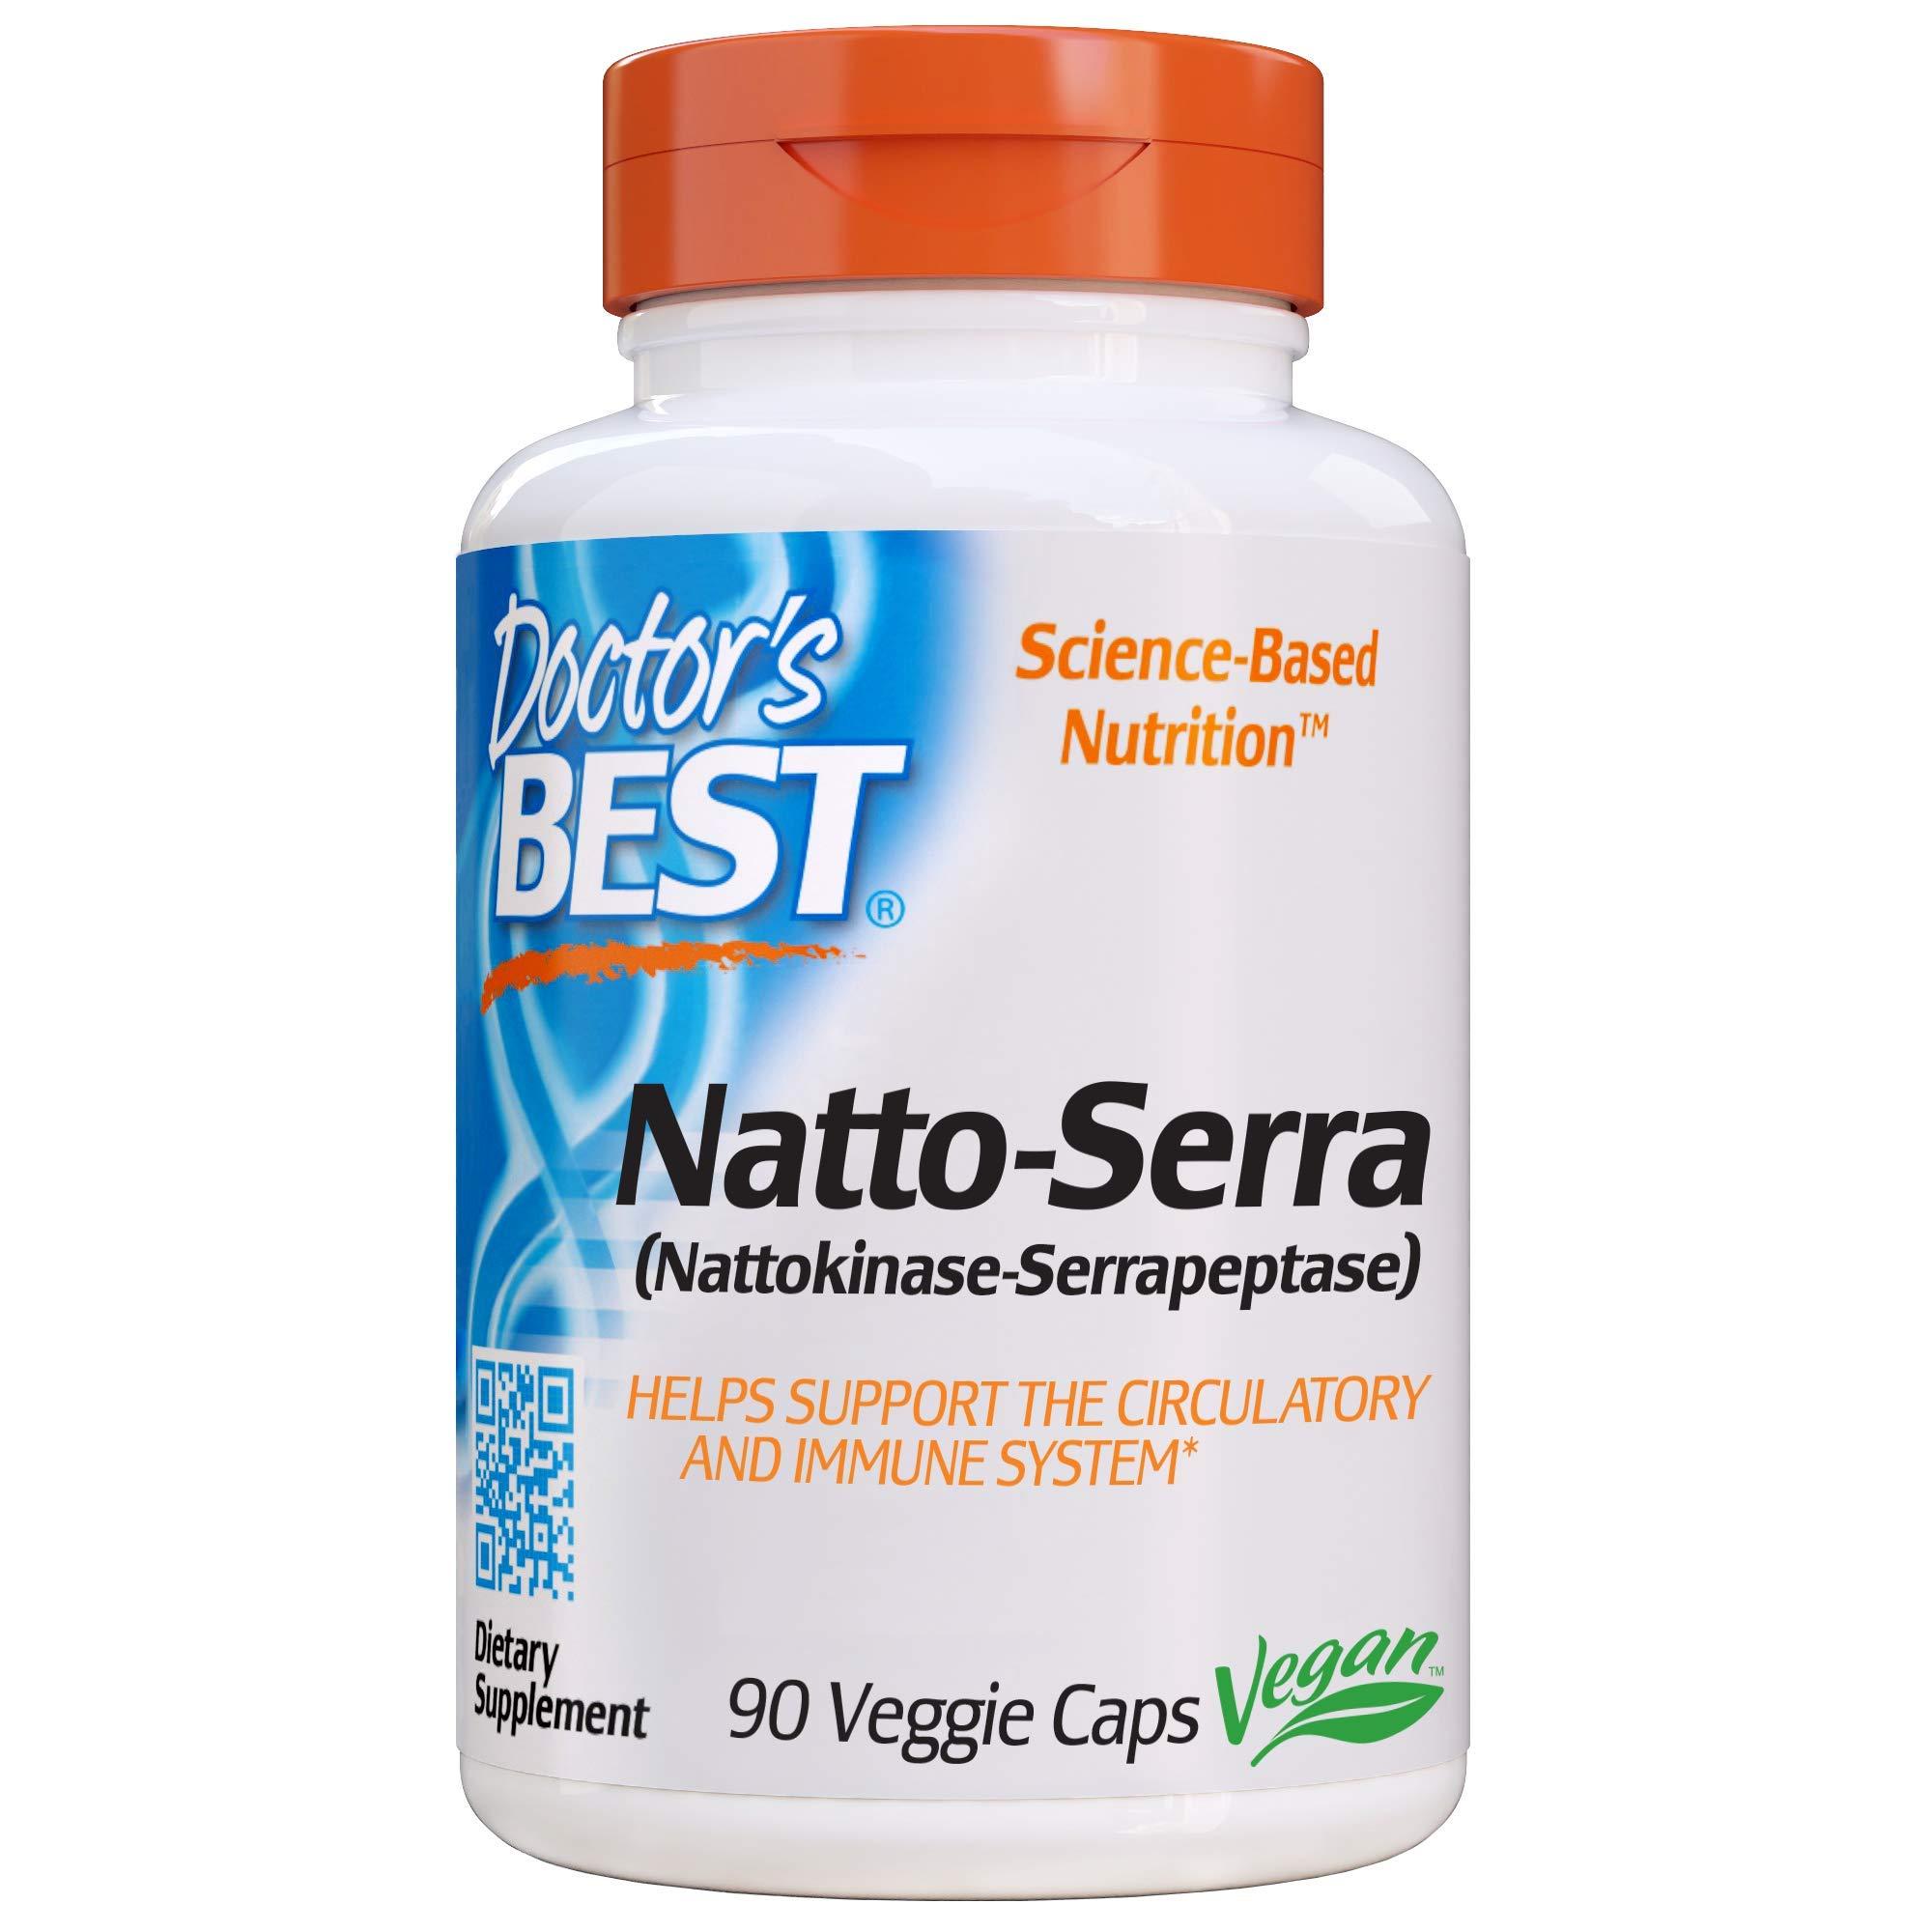 Doctor's Best Natto-Serra, Non-GMO, Vegan, Gluten Free, 90 Veggie Caps by Doctor's Best